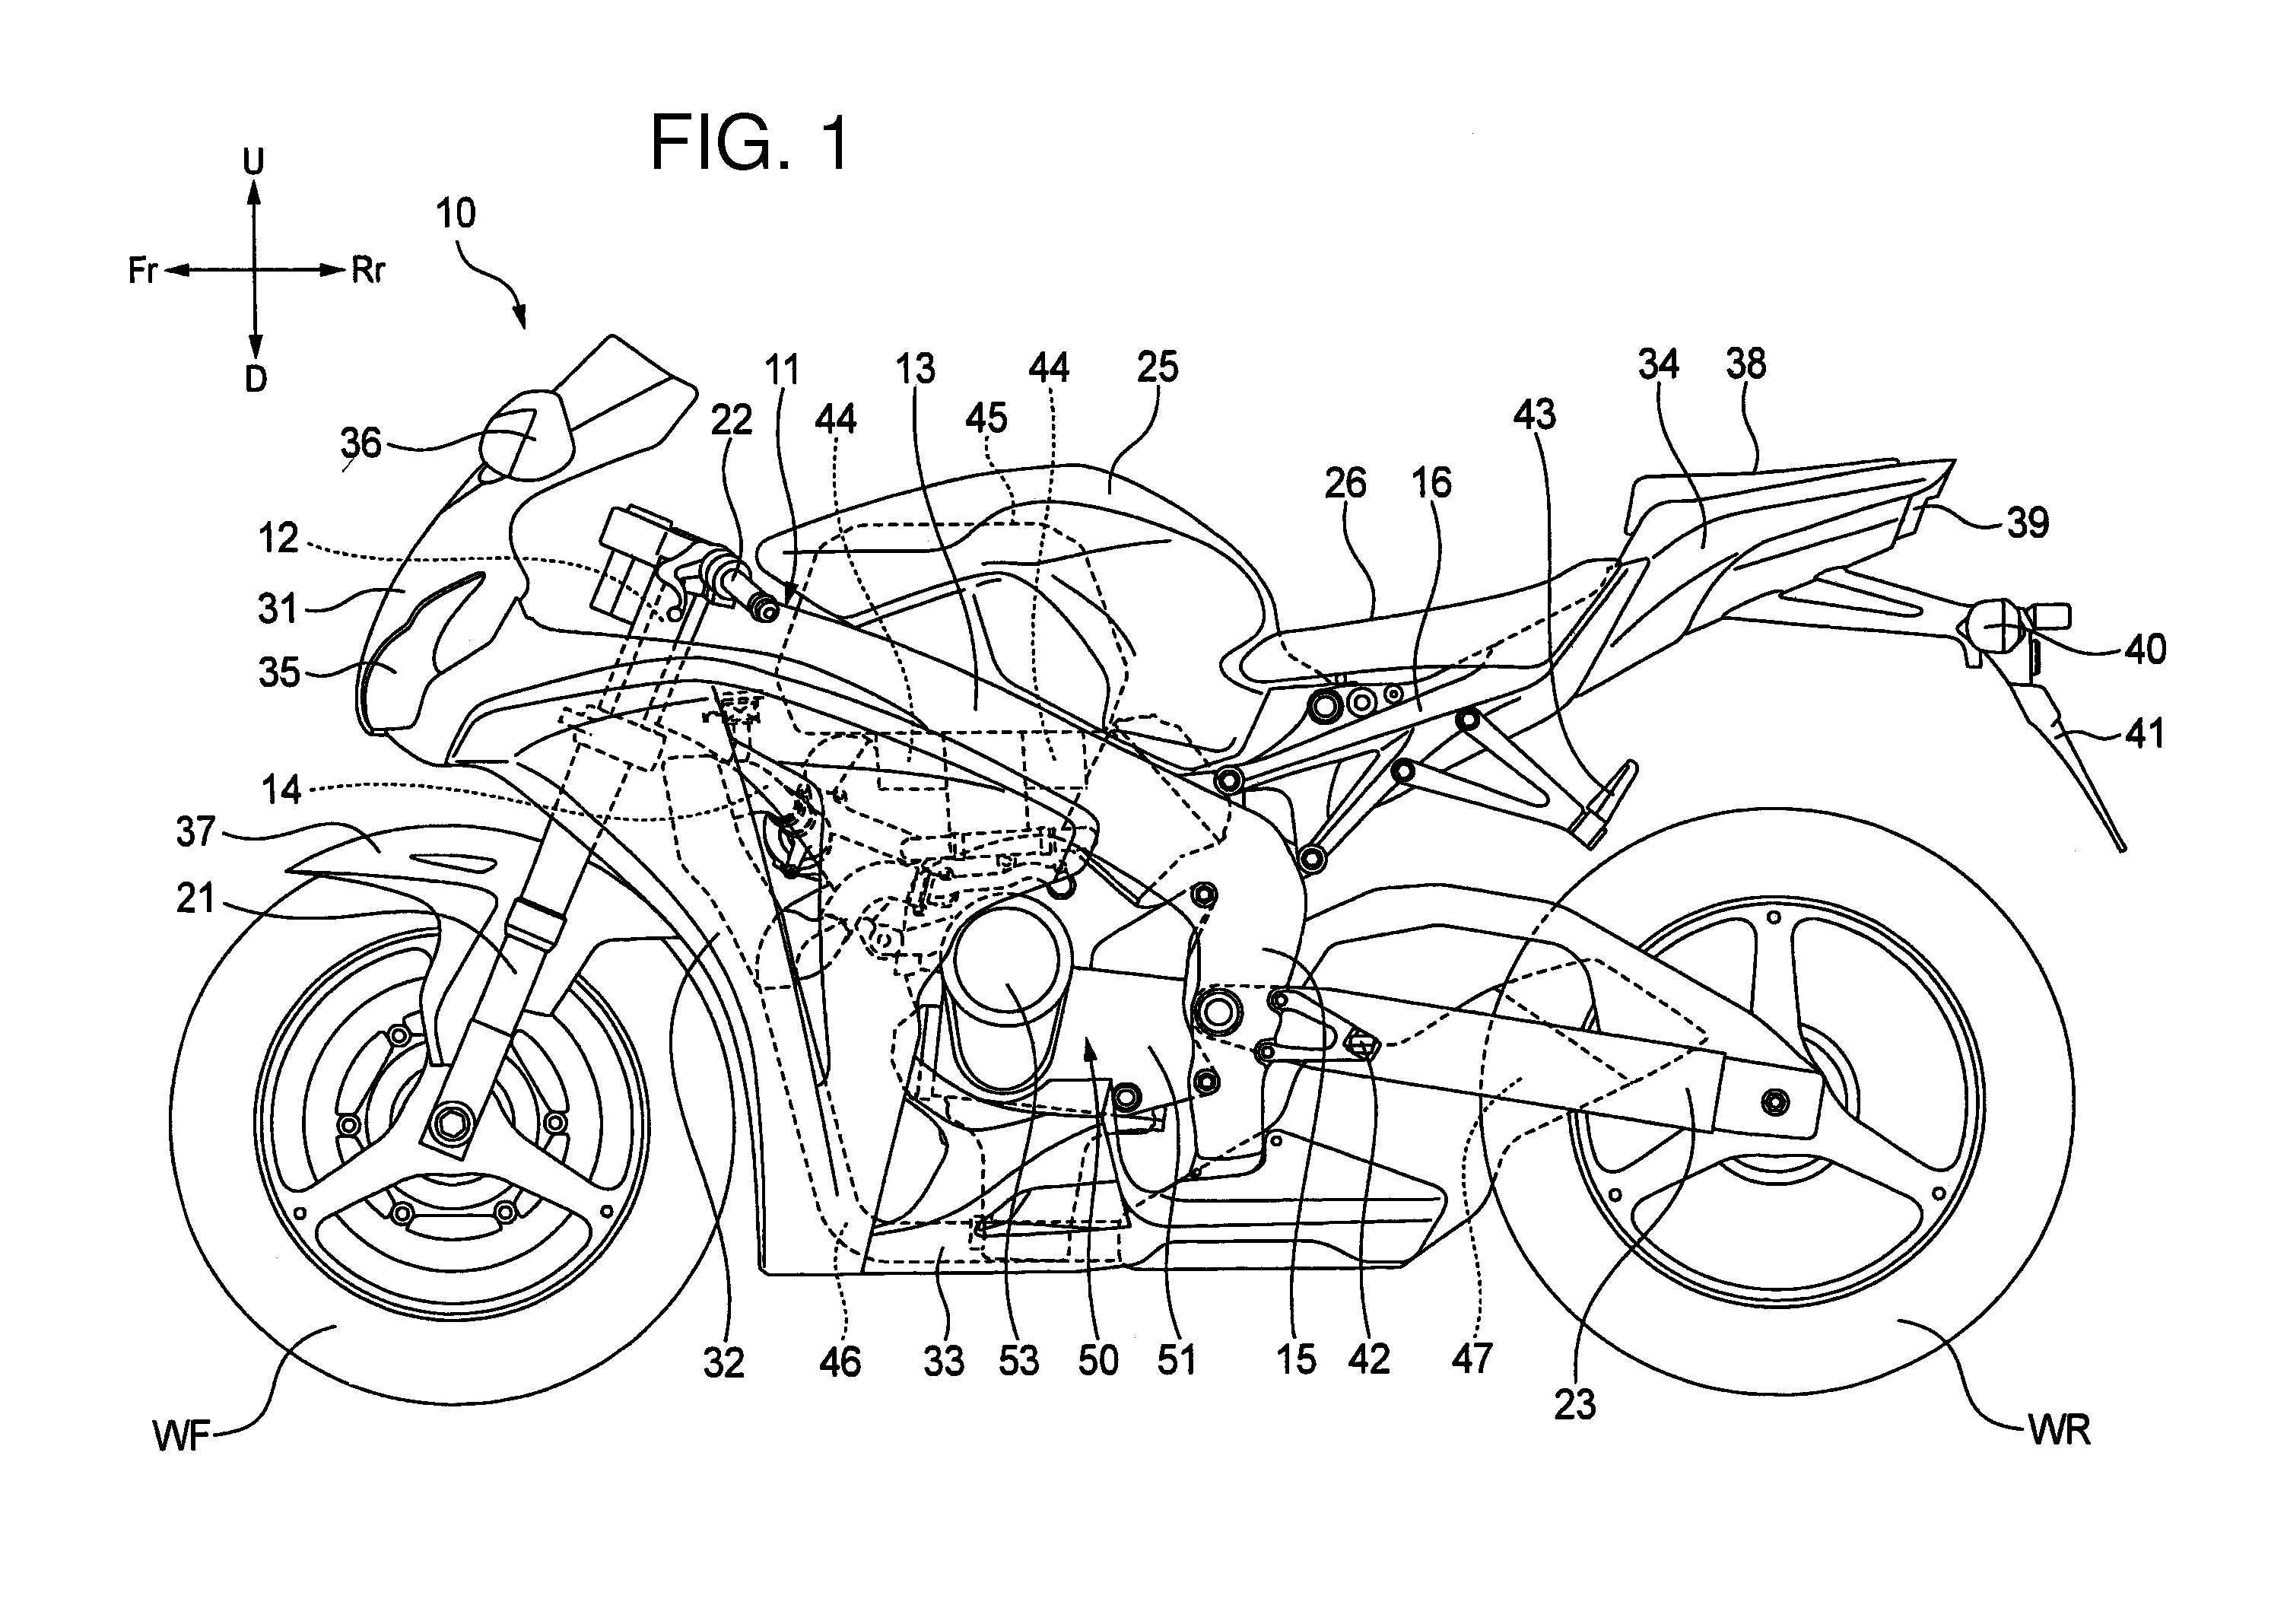 Interesting Honda Patent Drawings